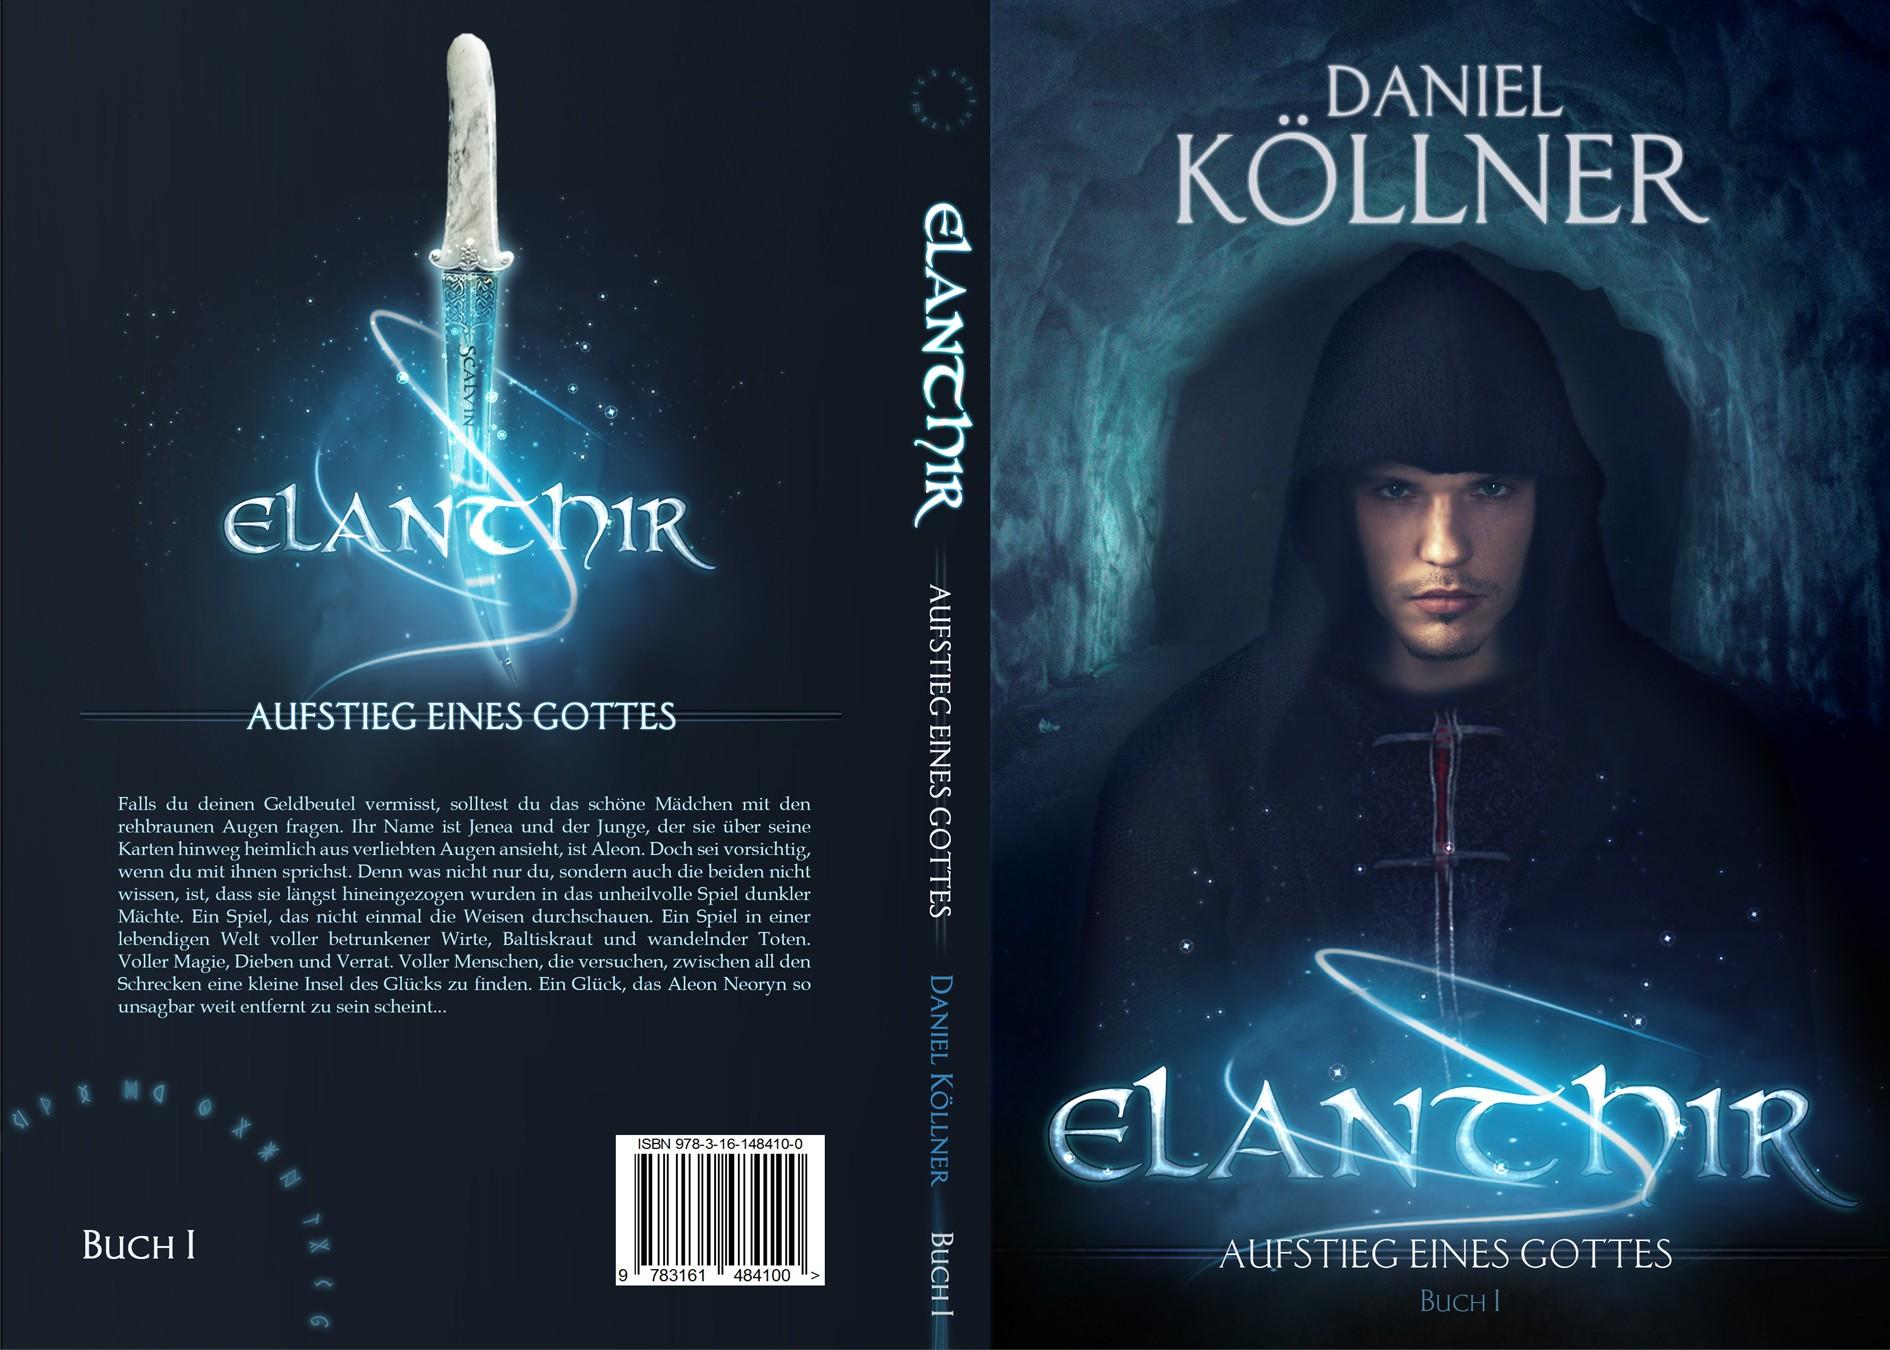 Fantasy book and ebook cover